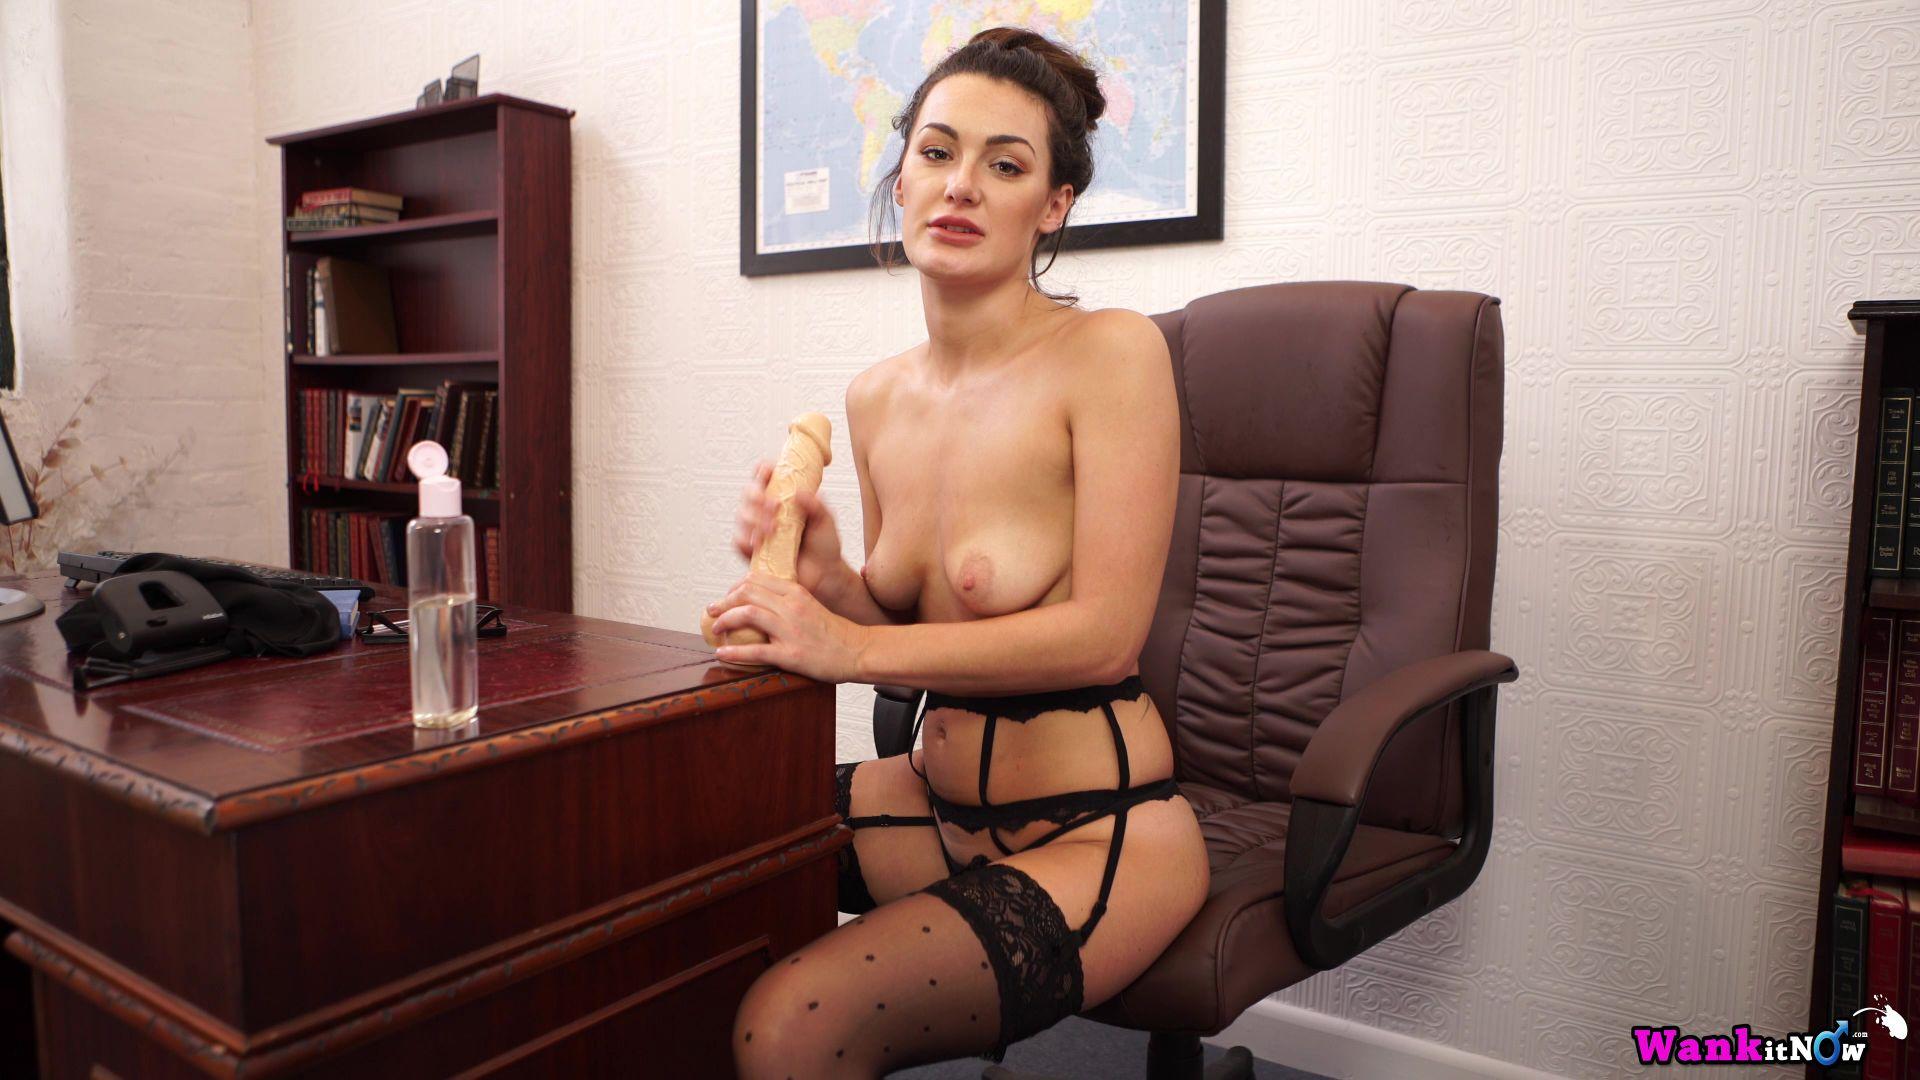 She needs cock like i need facebook